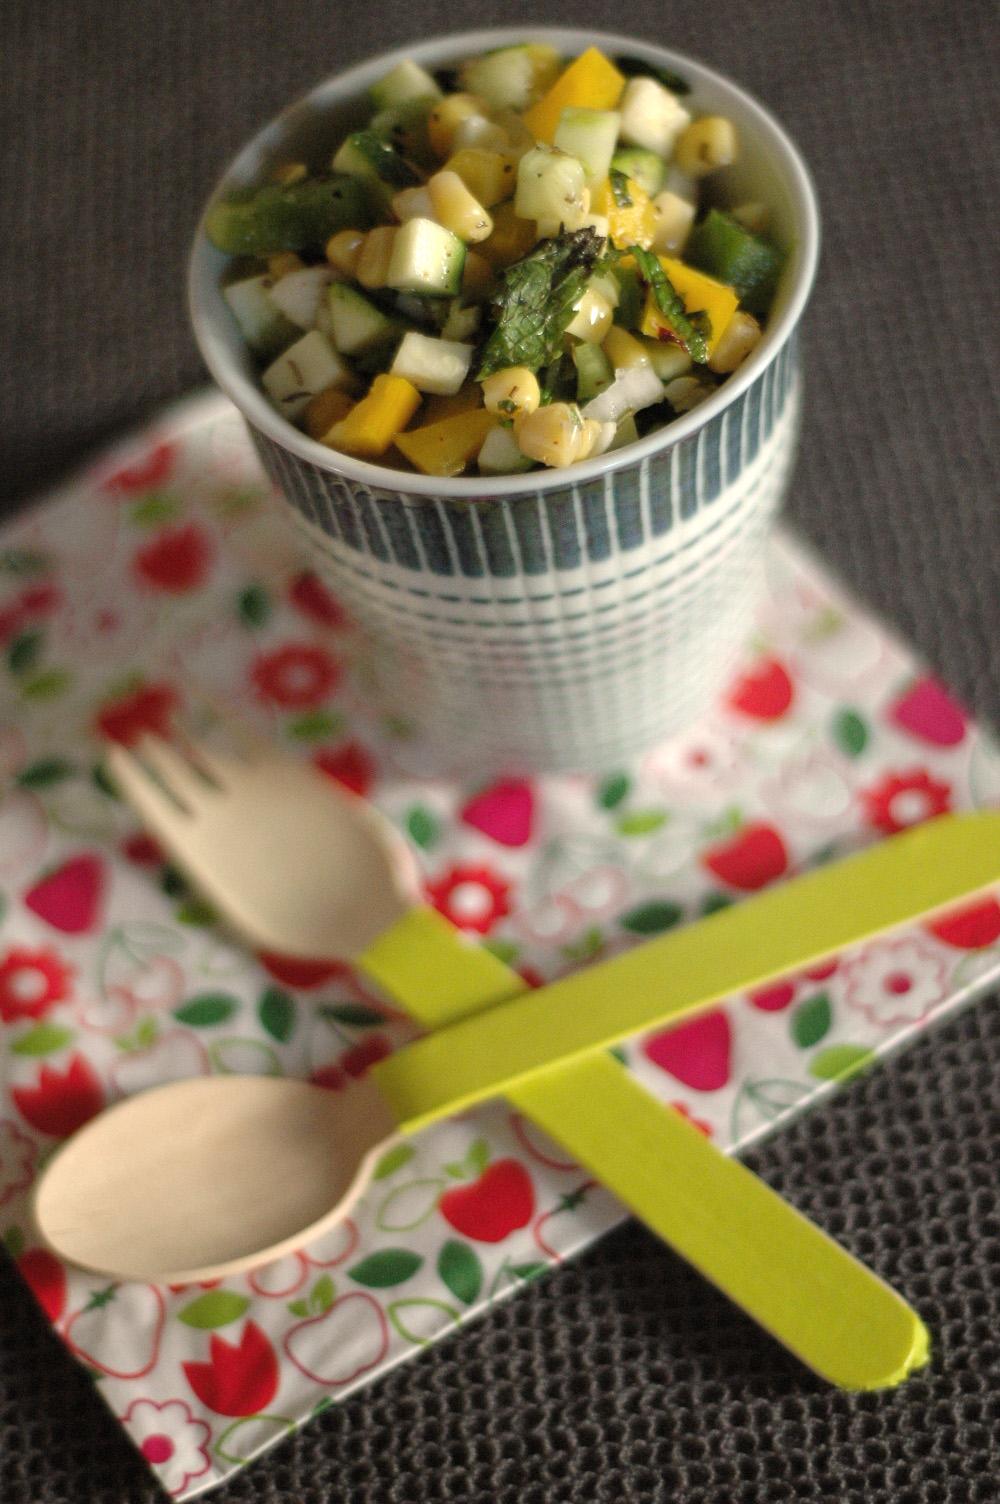 110711 Salade pickles de maïs